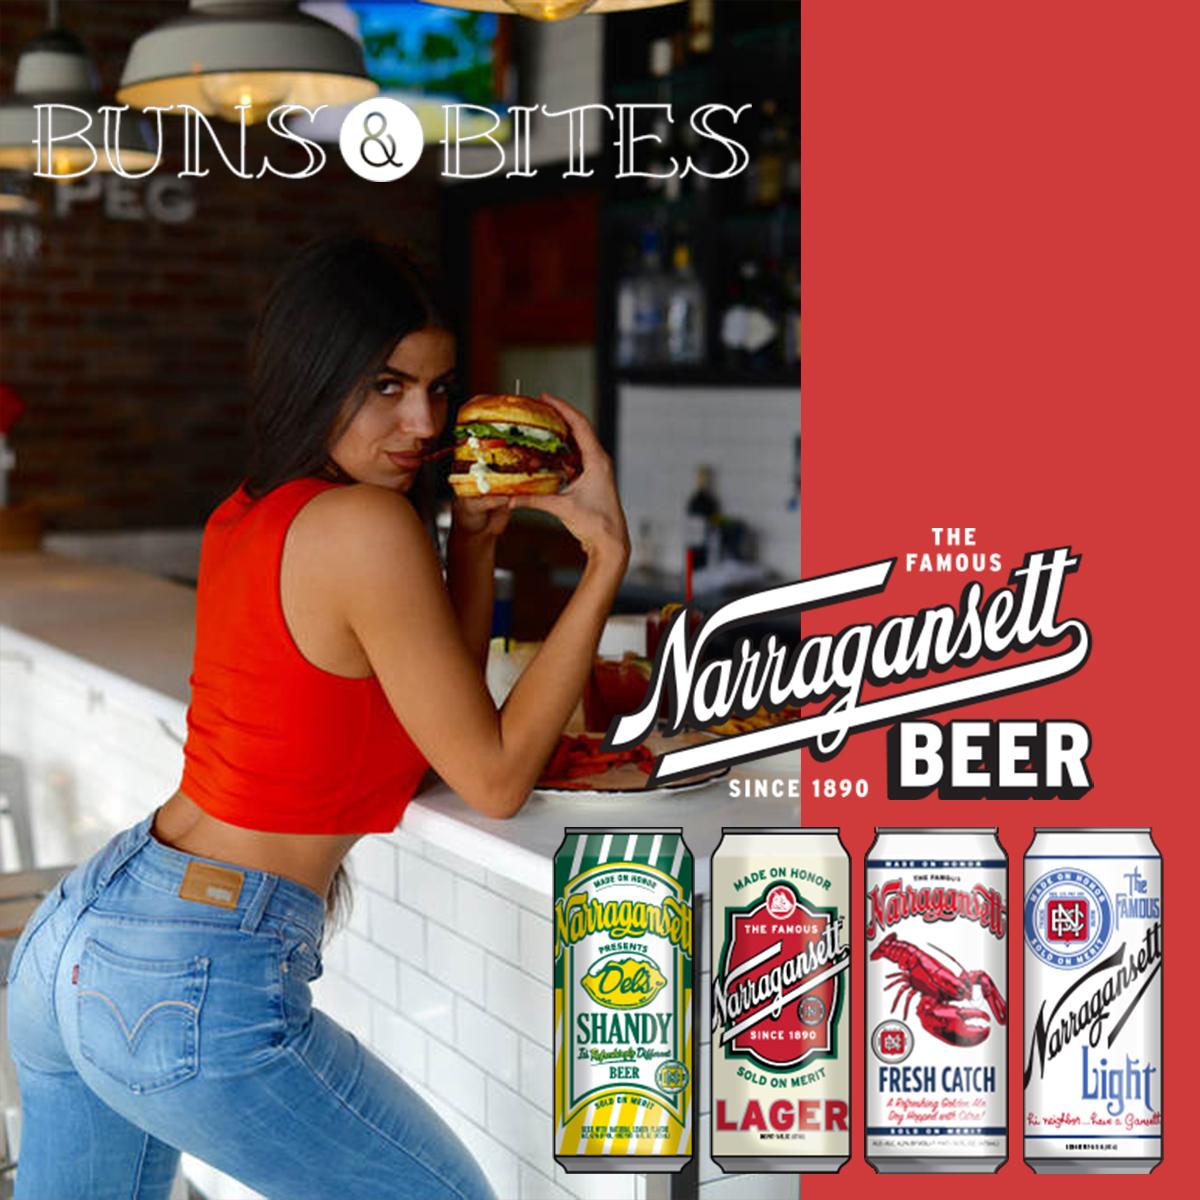 Special Guest Laura Afonso of @bunsandbitesSponsored by Narragansett Beer -